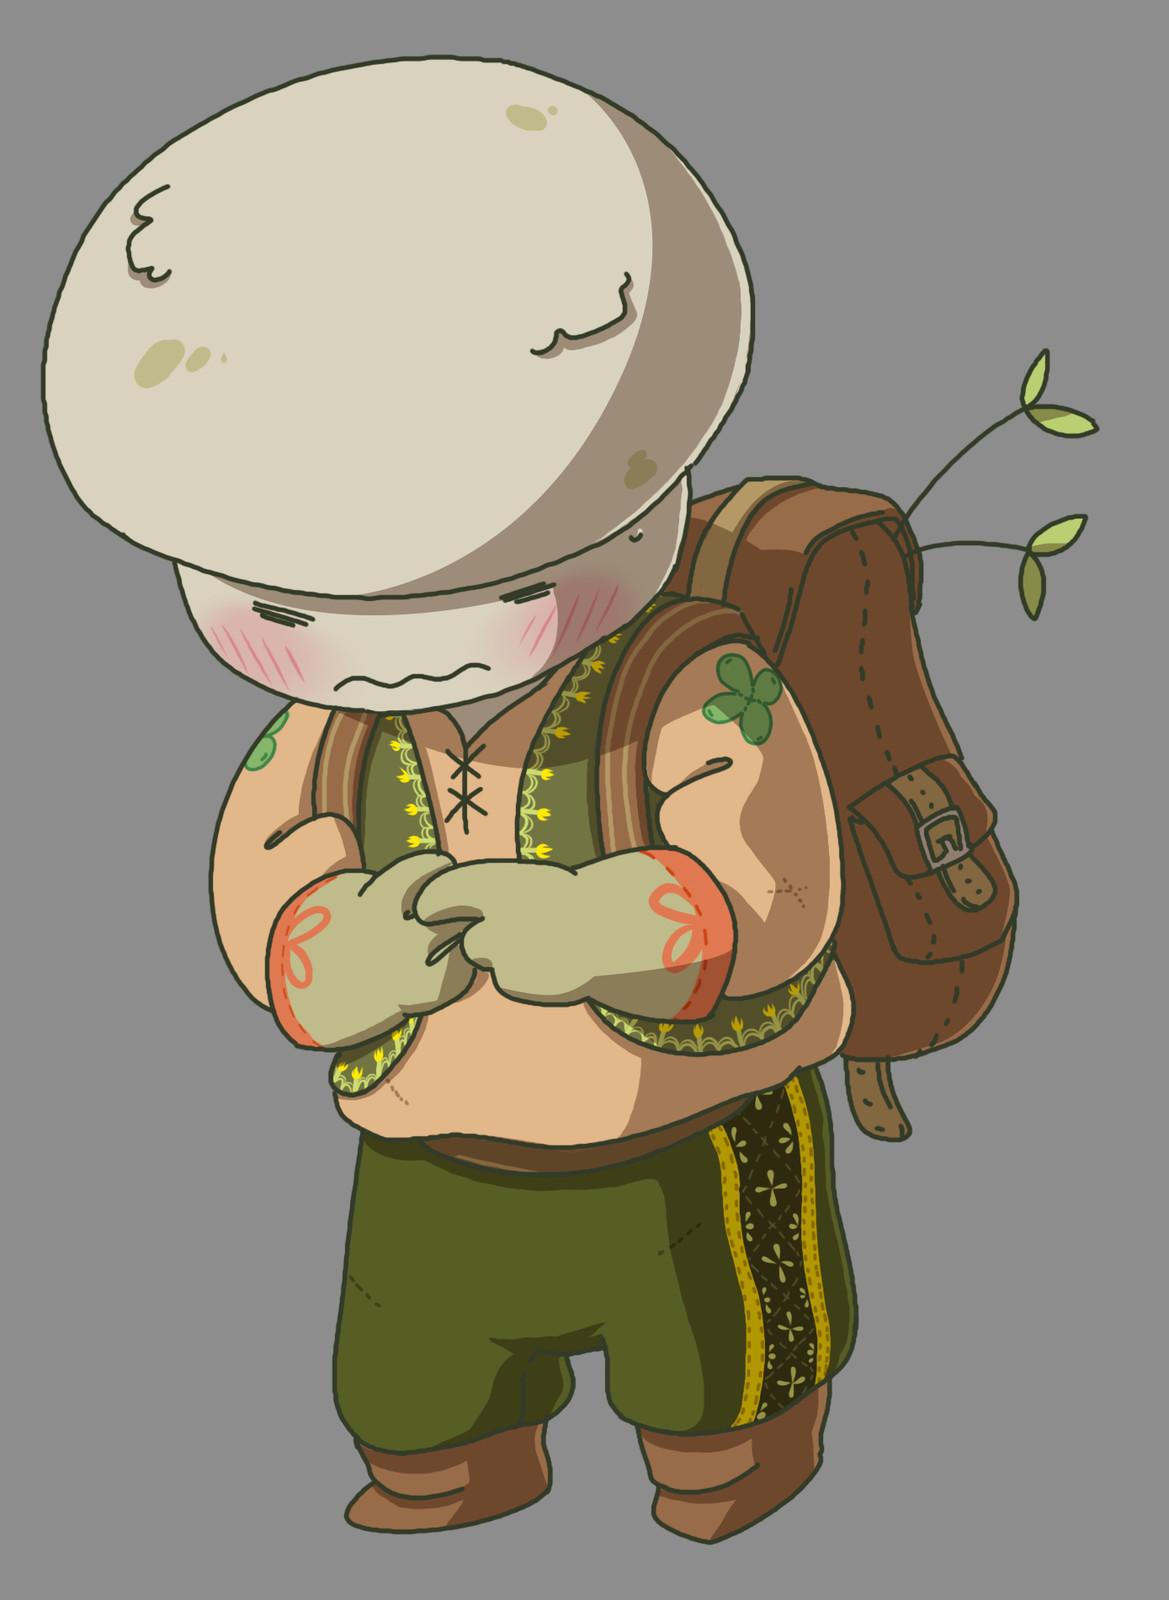 A shy mushroom gardener.